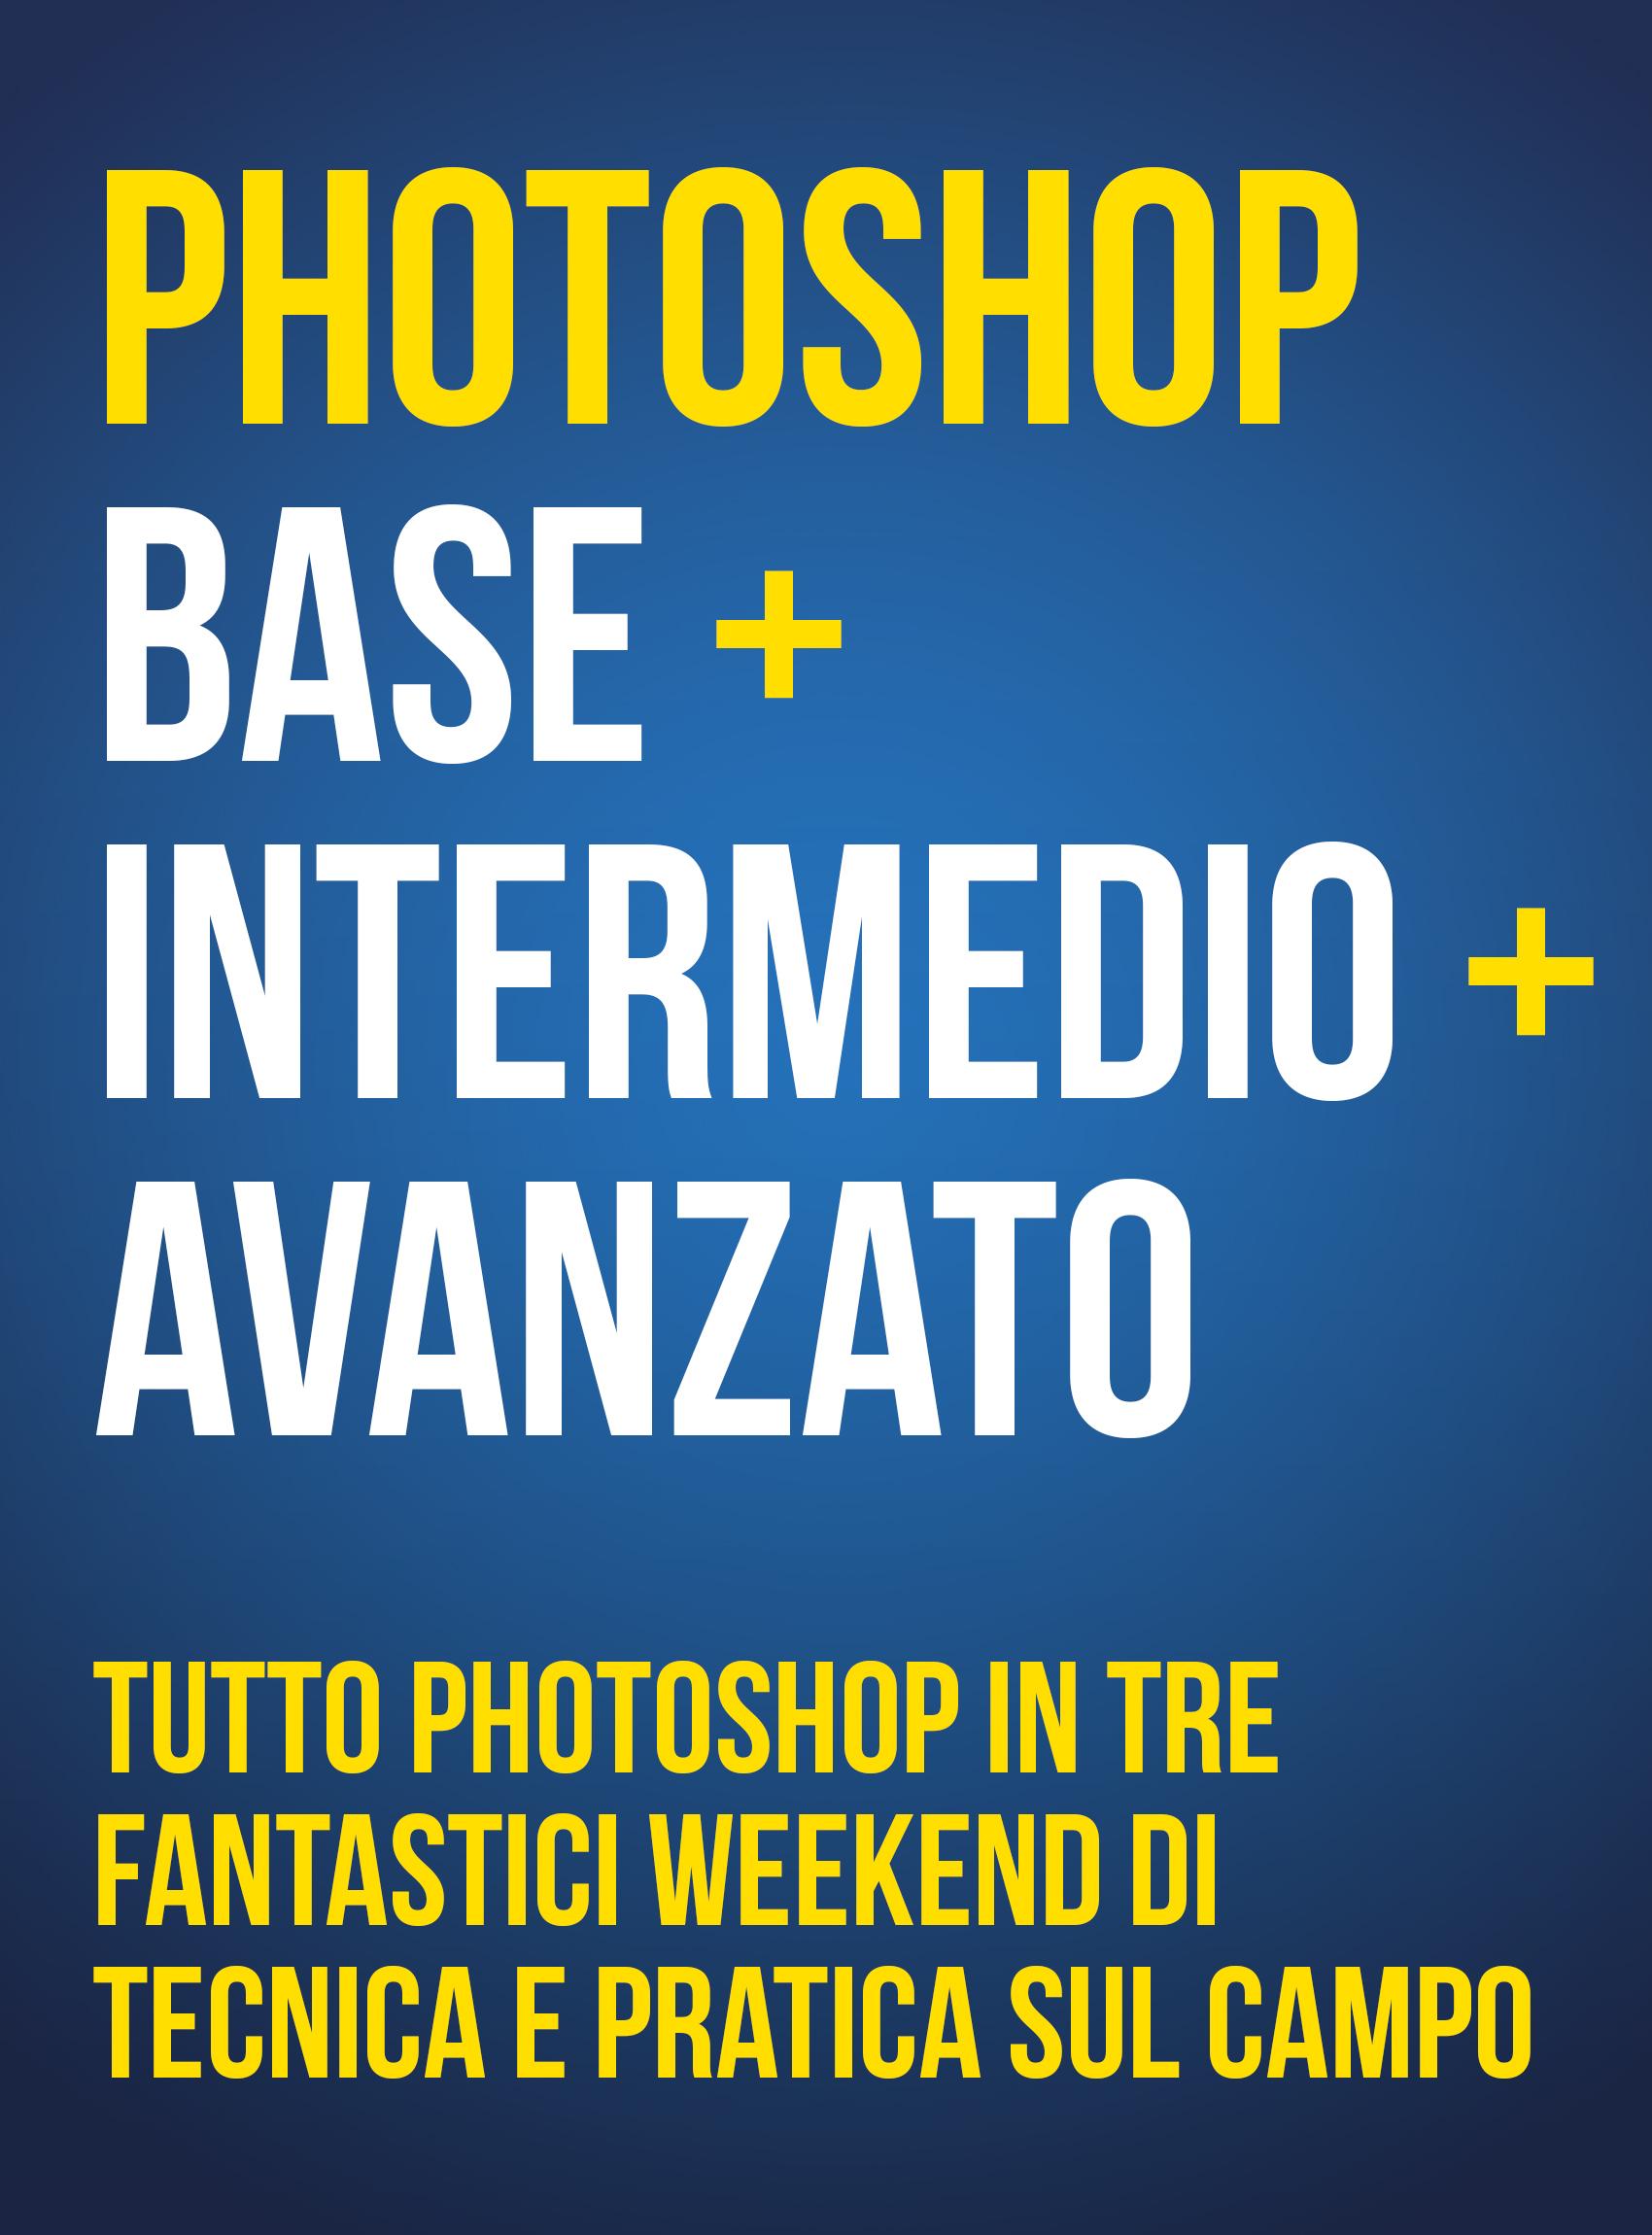 Workshop Photoshop Percorso Completo